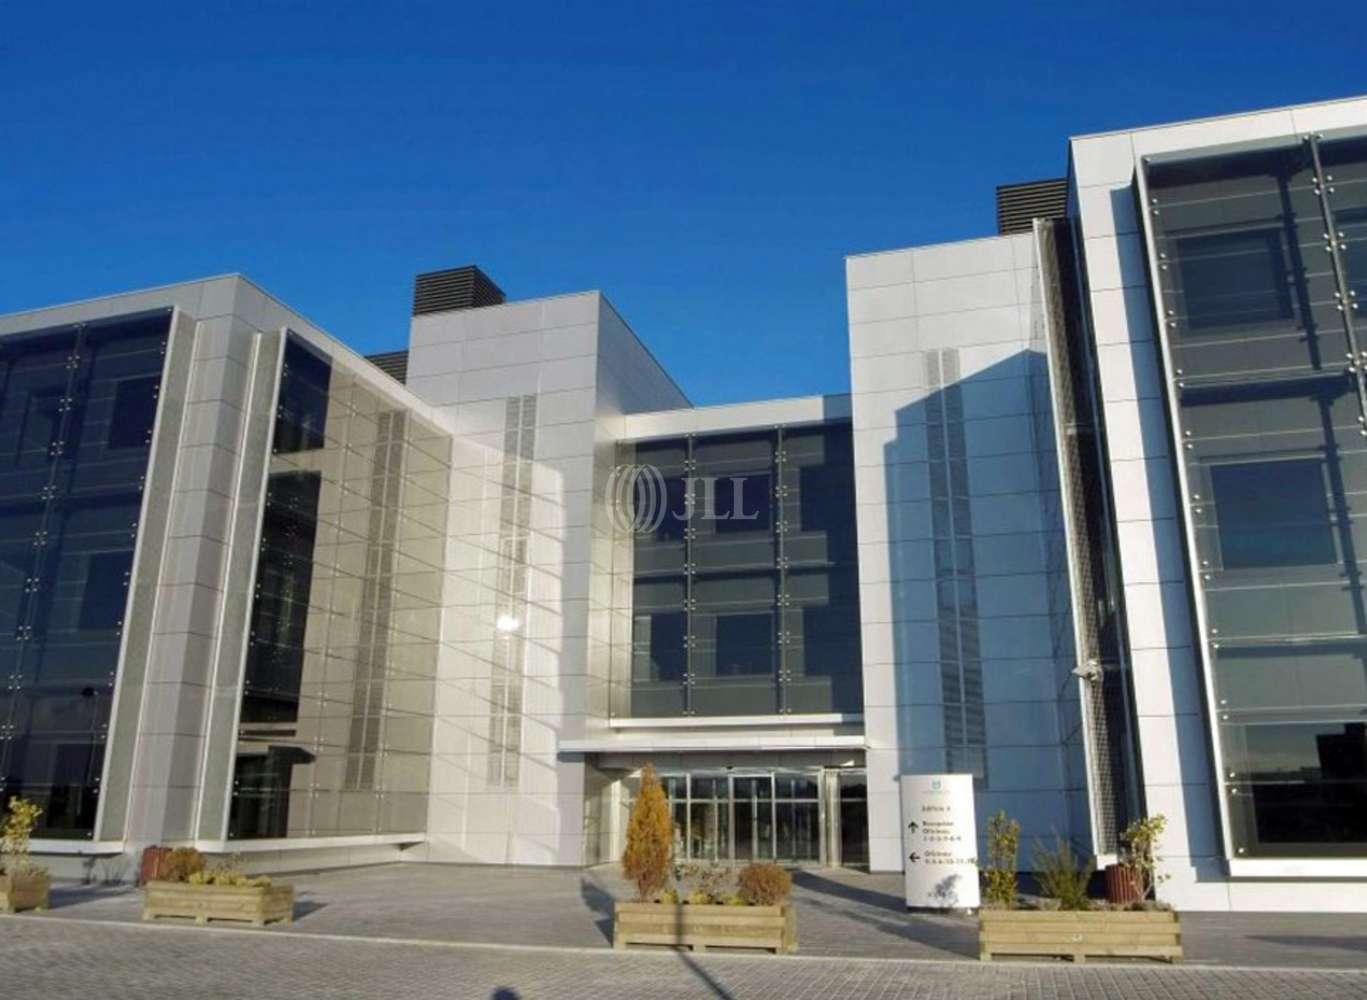 Oficina Las rozas de madrid, 28232 - Edificio 3. P.E. Alvia - 5793